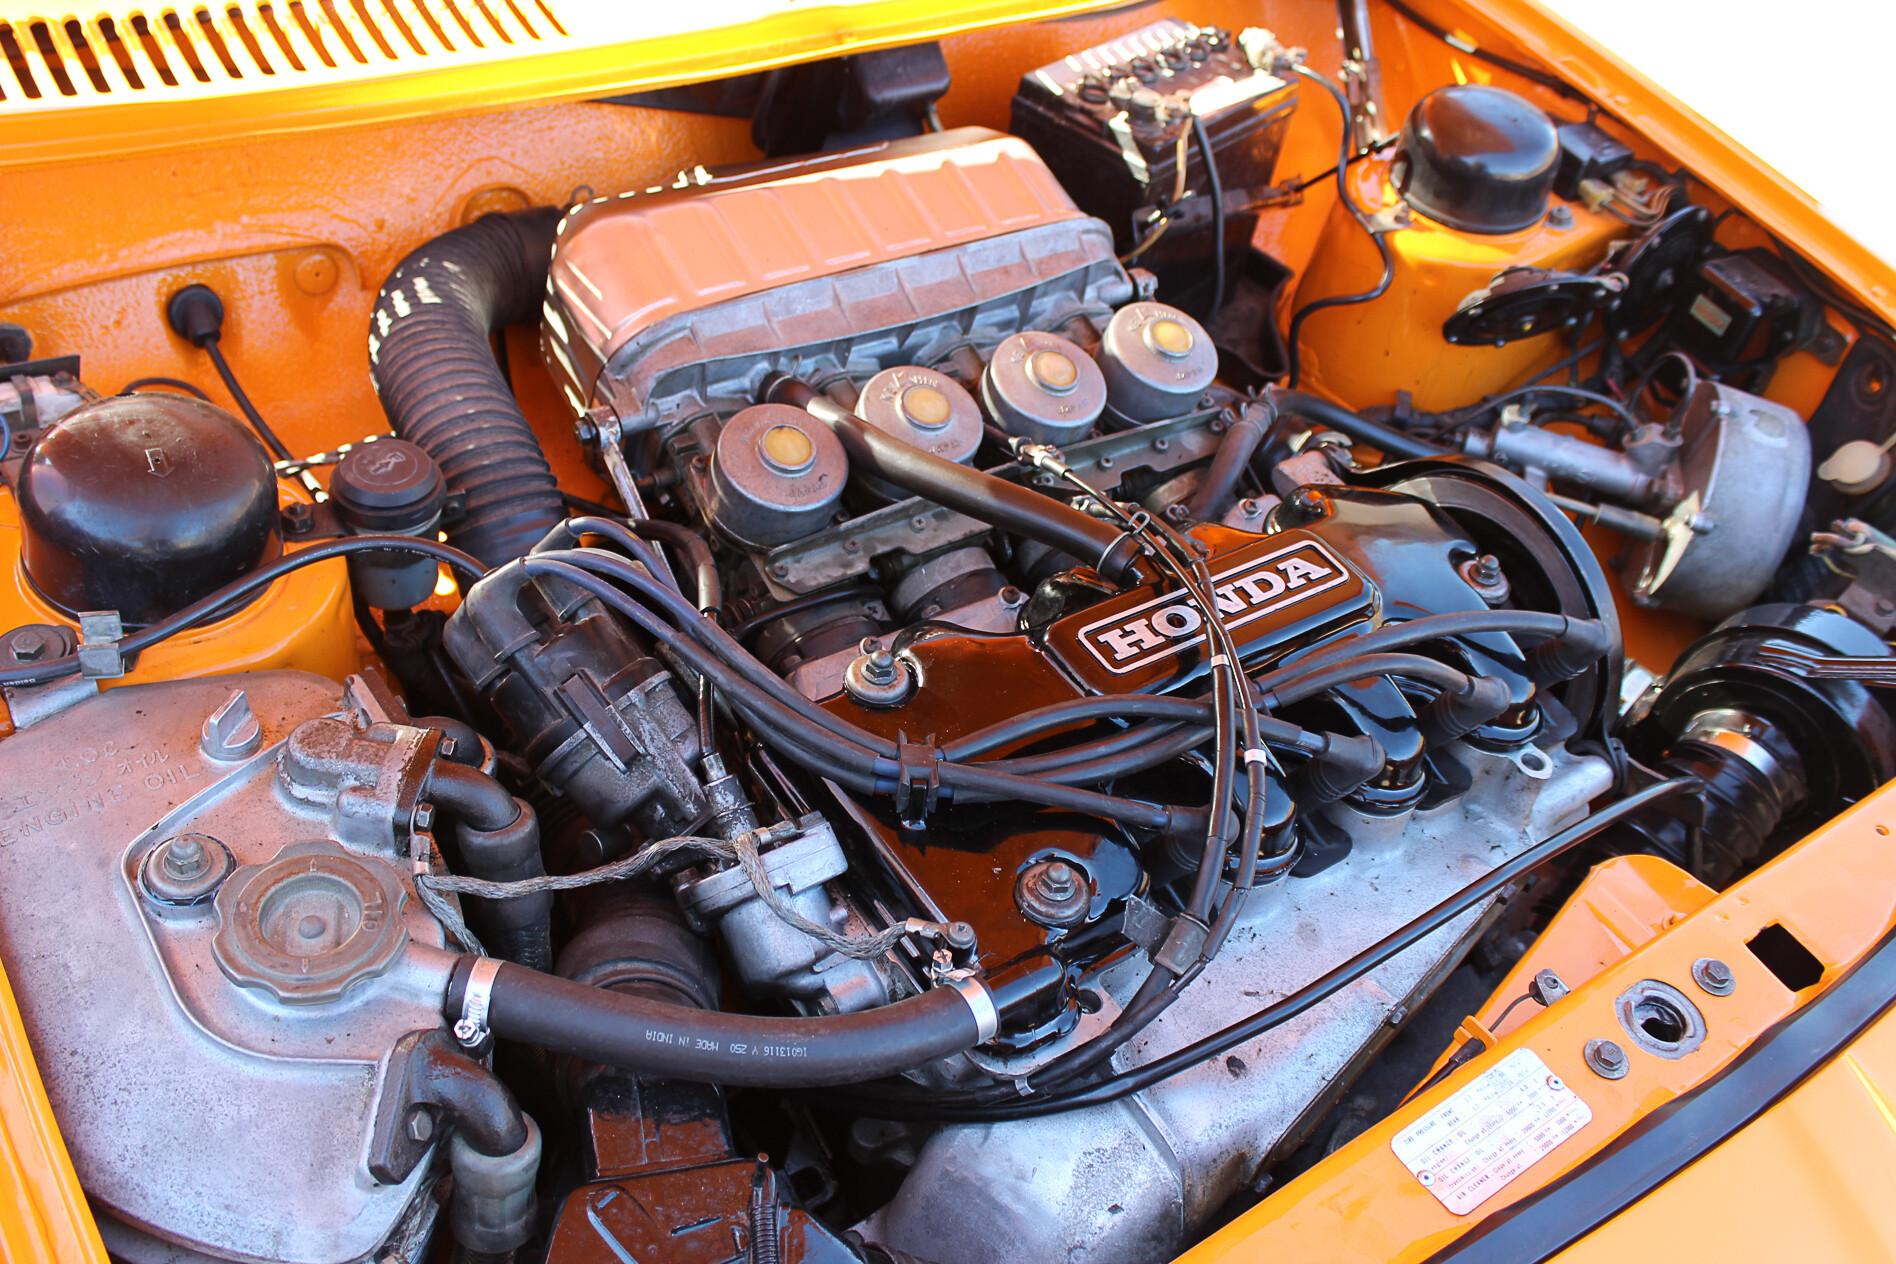 Honda 1300 Resized 8 Jpg